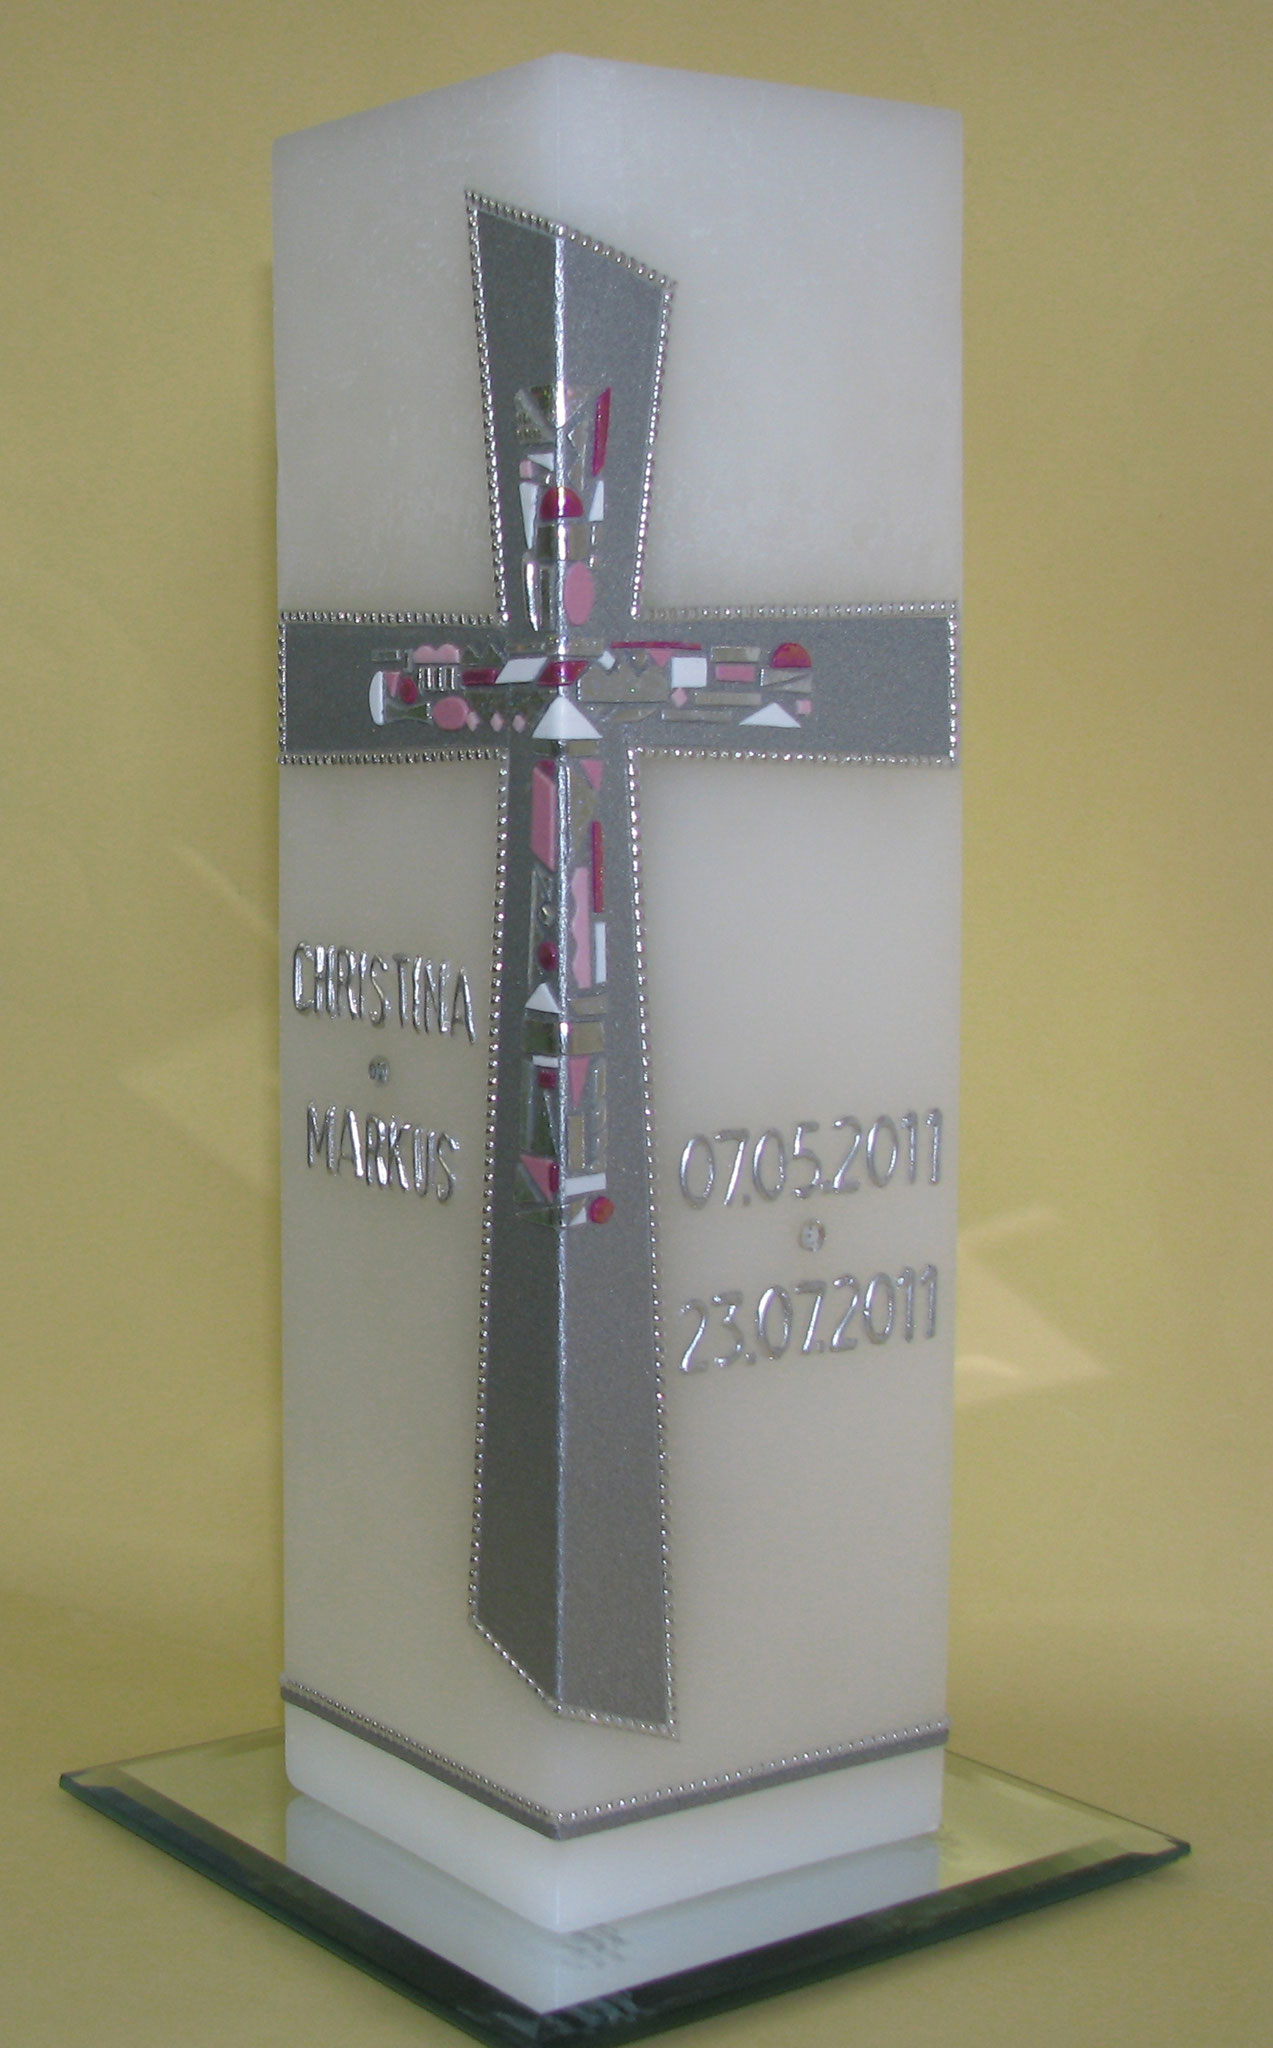 HE-0055, quadratisch, HxB ca 24 cm x 7,5 cm, Preis ca. € 48,--